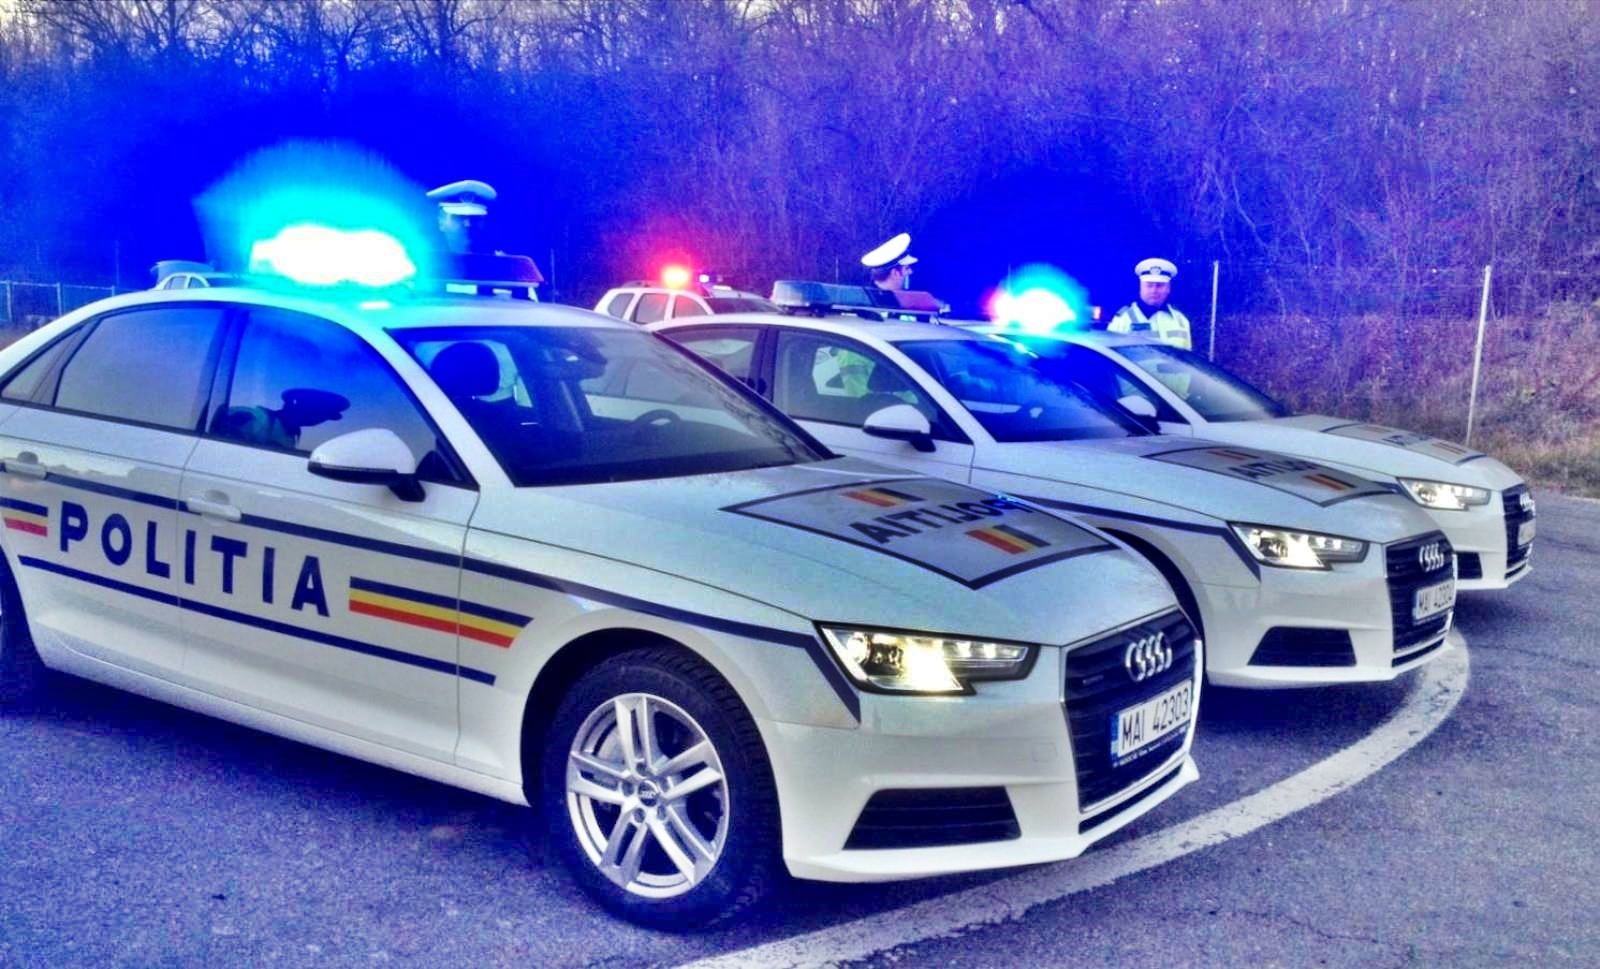 Politia Romana atentionare soferi prudenta